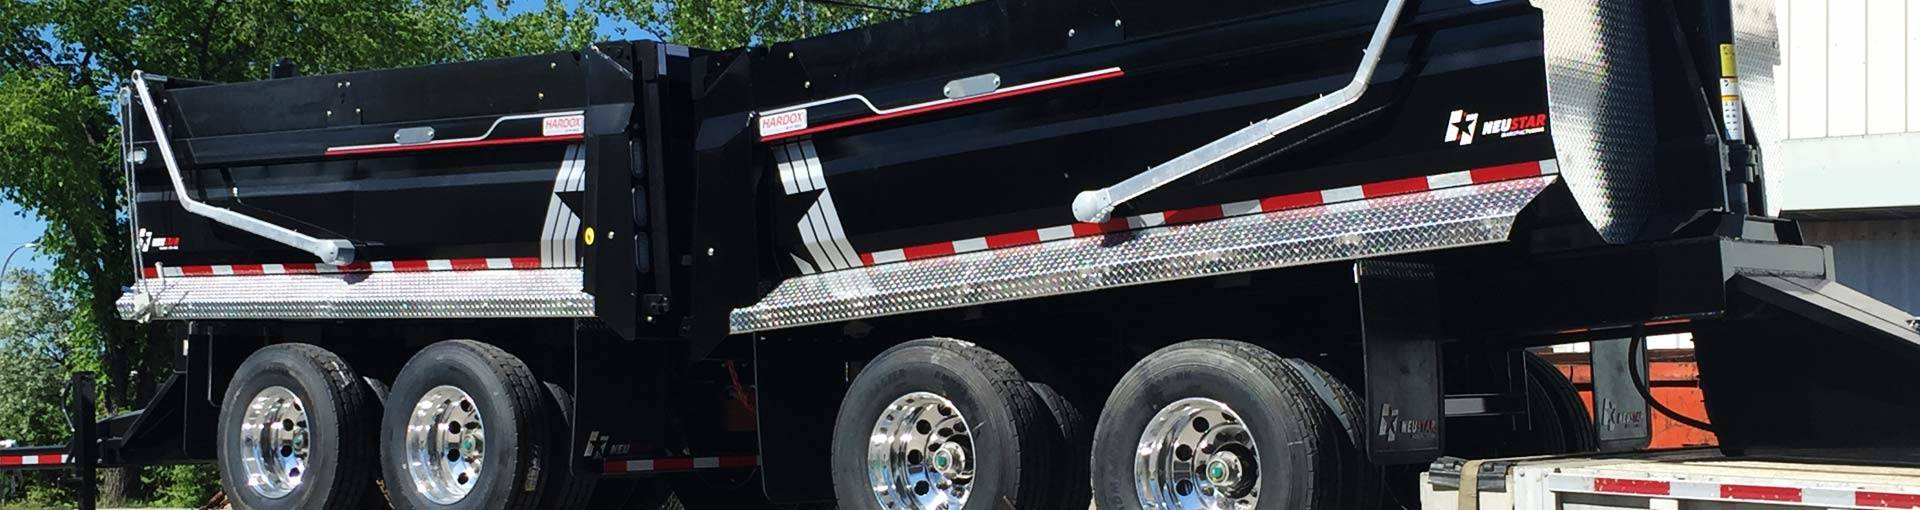 dump-boxes-dump-truck-bodies-neustar-pup-trailers